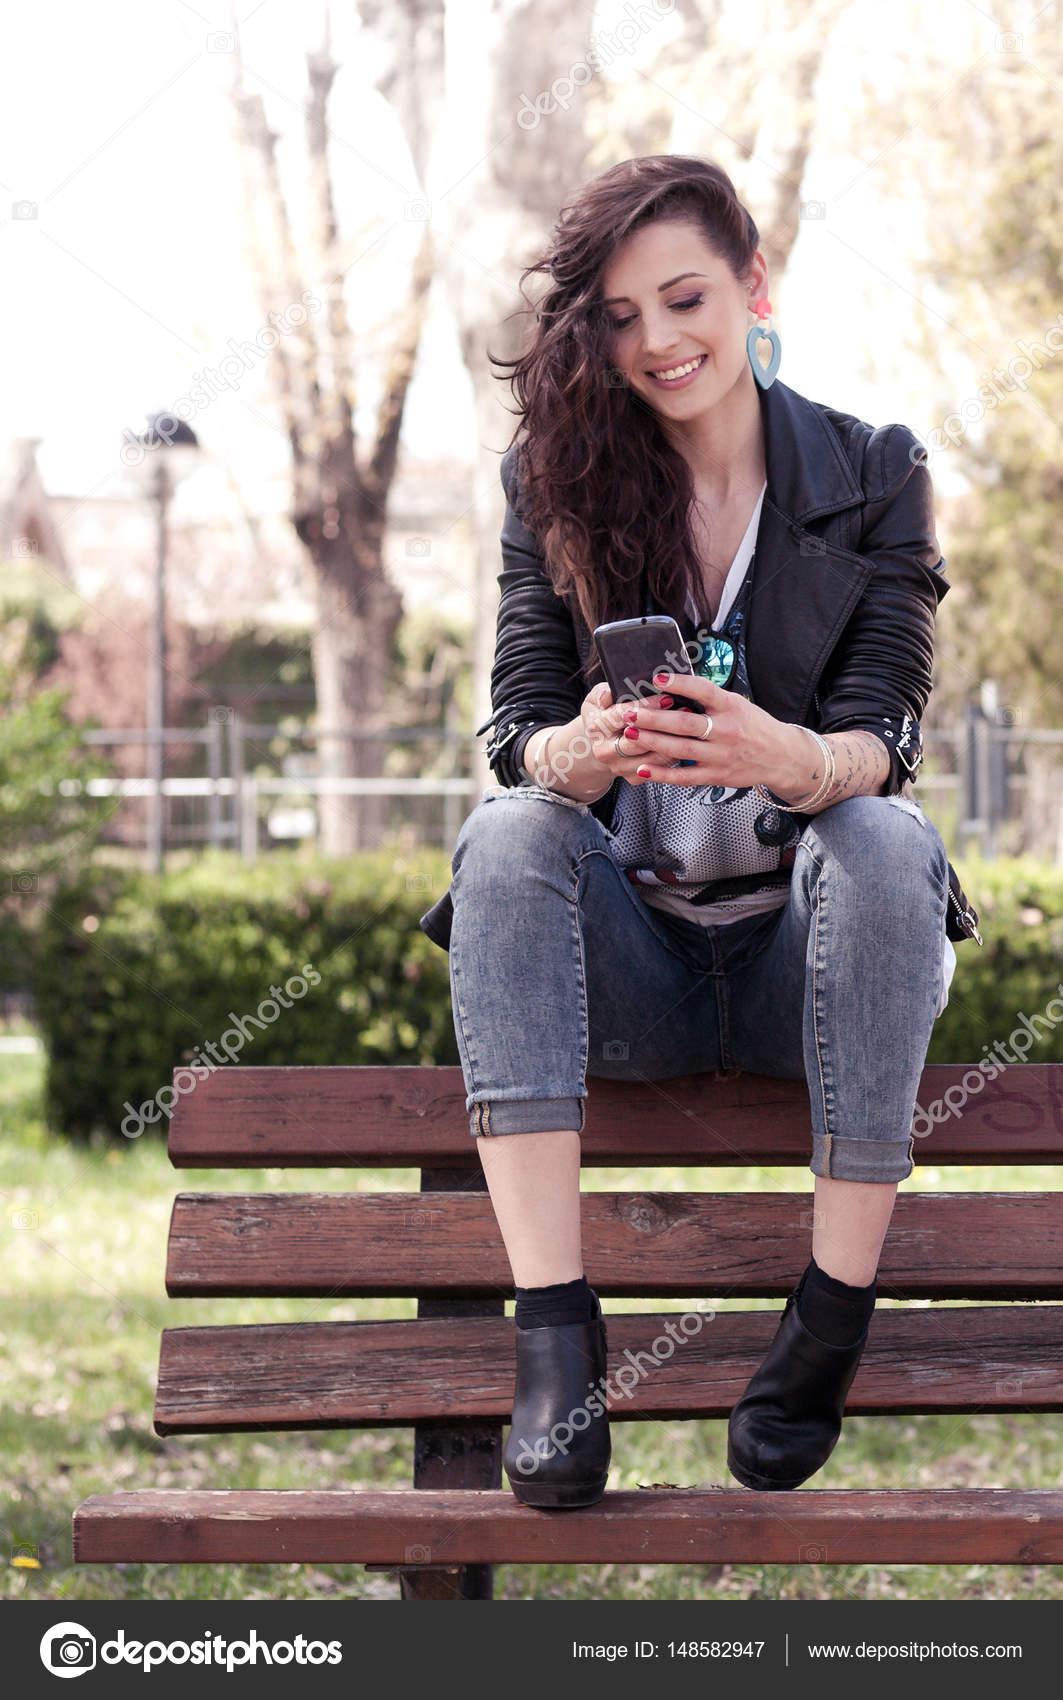 Beautiful girls in public